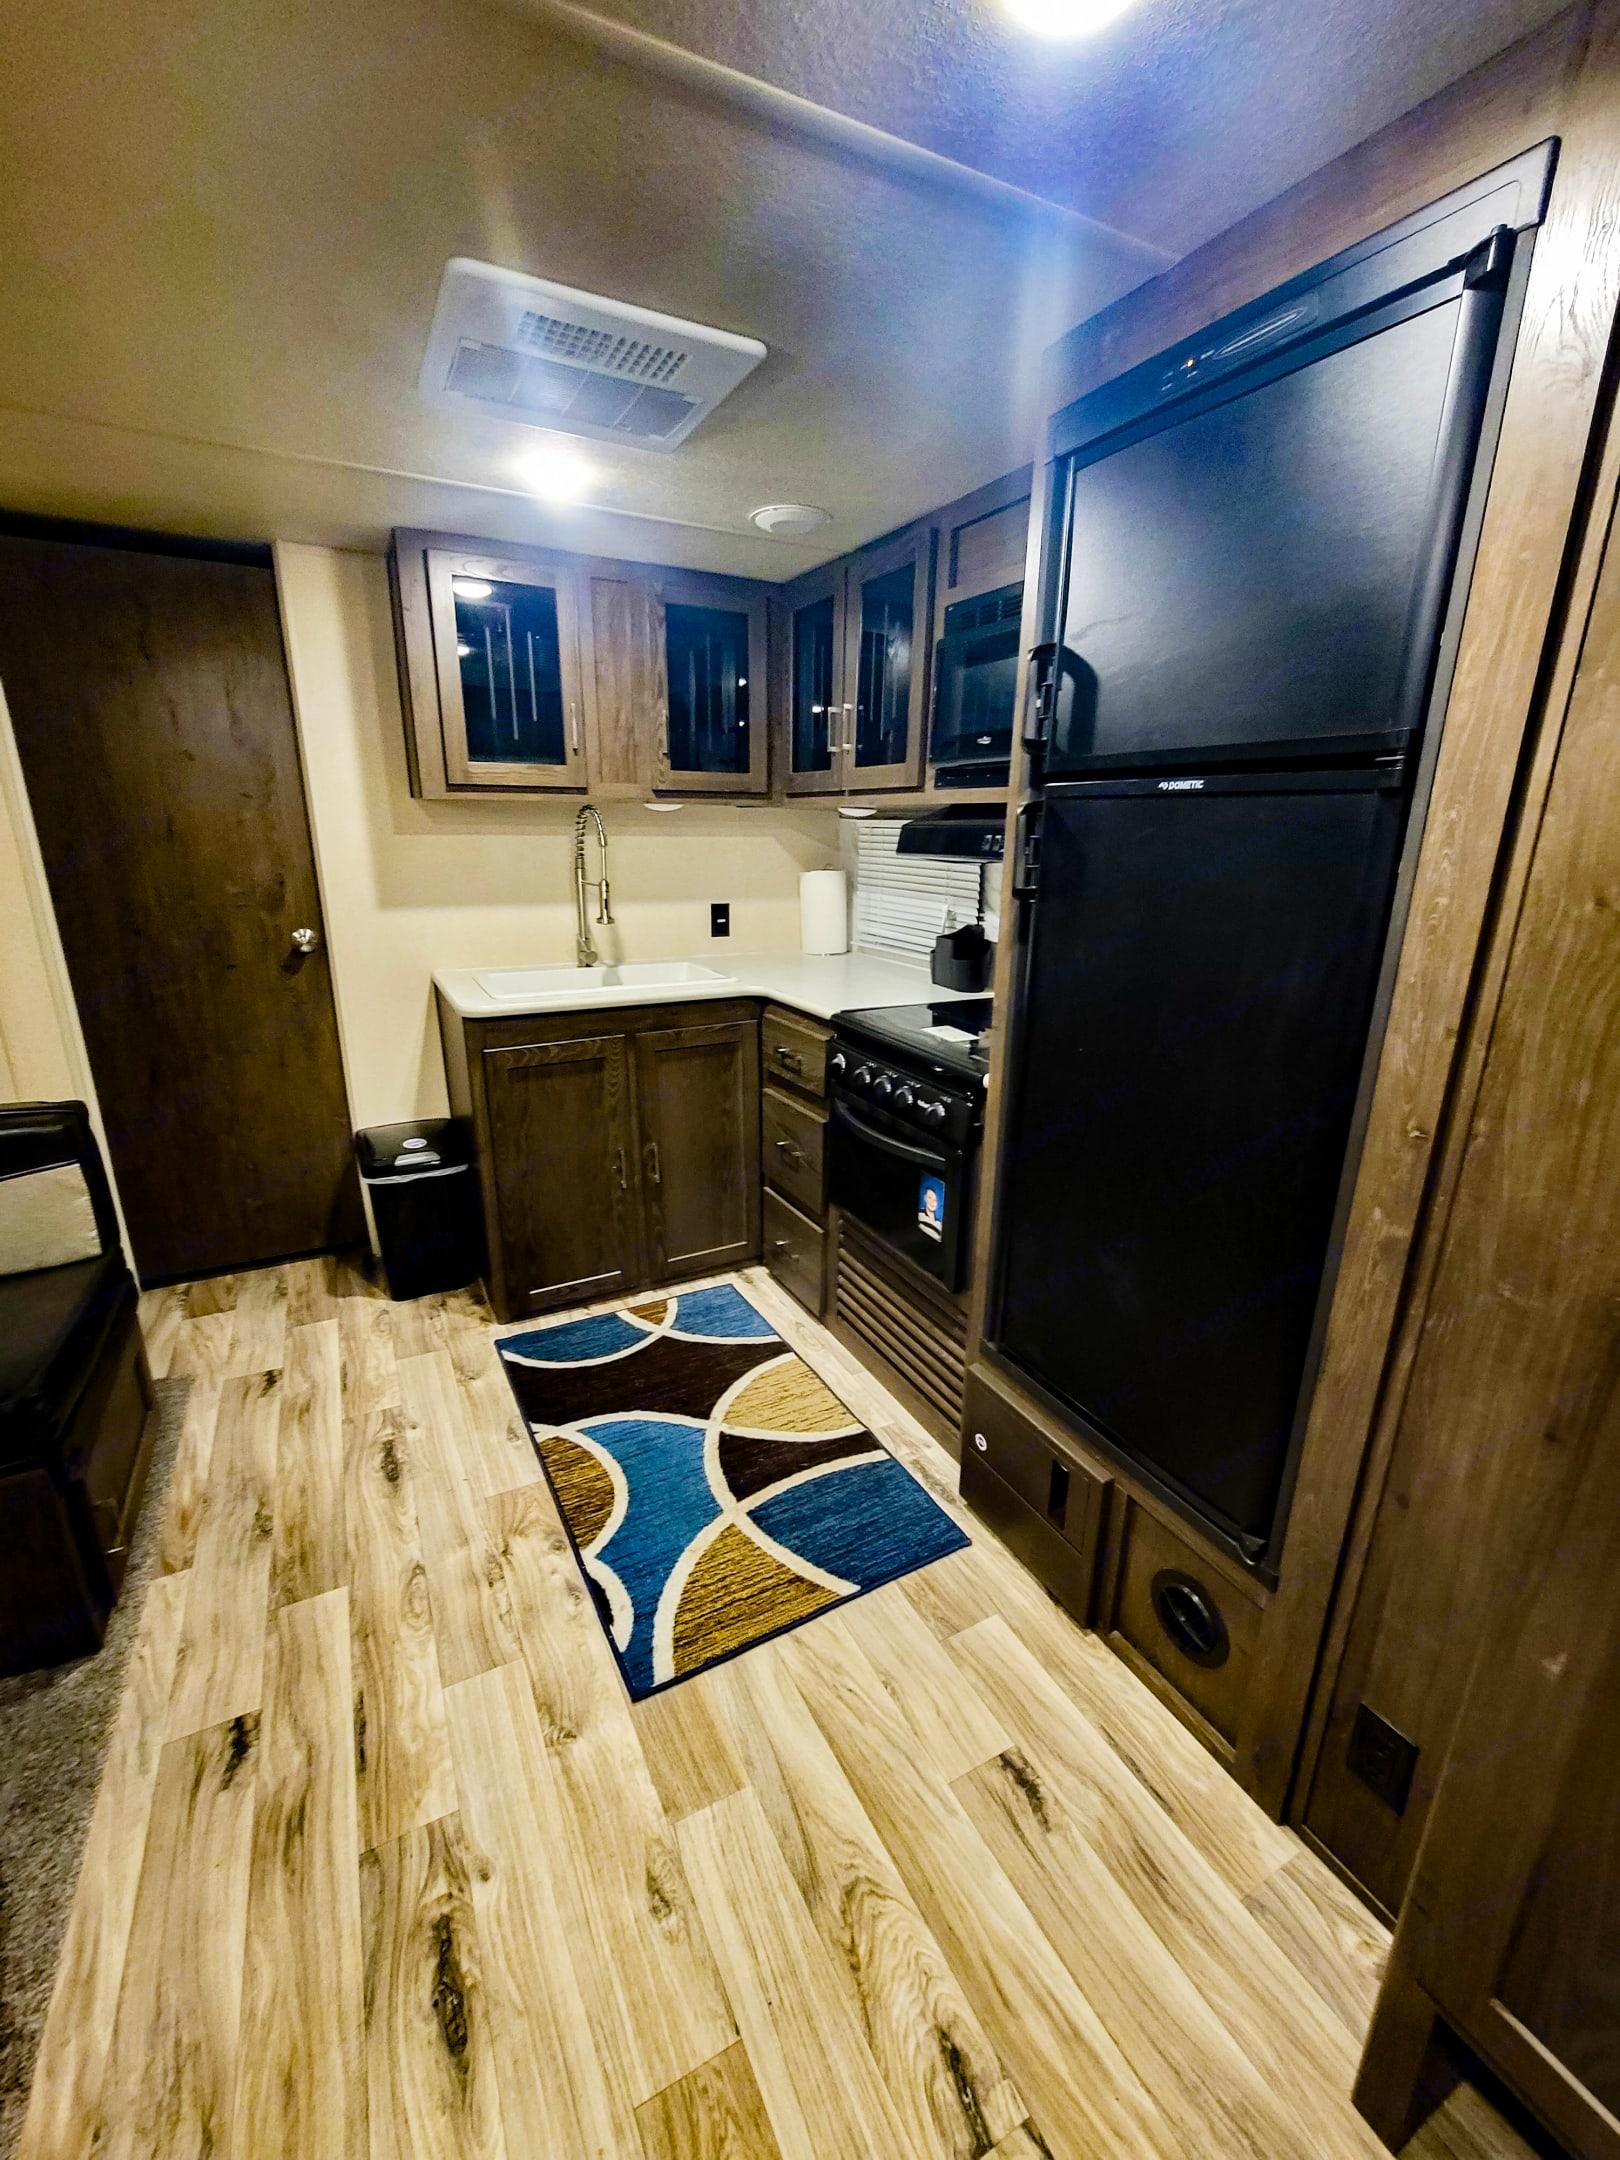 Propane Stove - Propane/electric refrigerator. Forest River Heritage Glen 2018